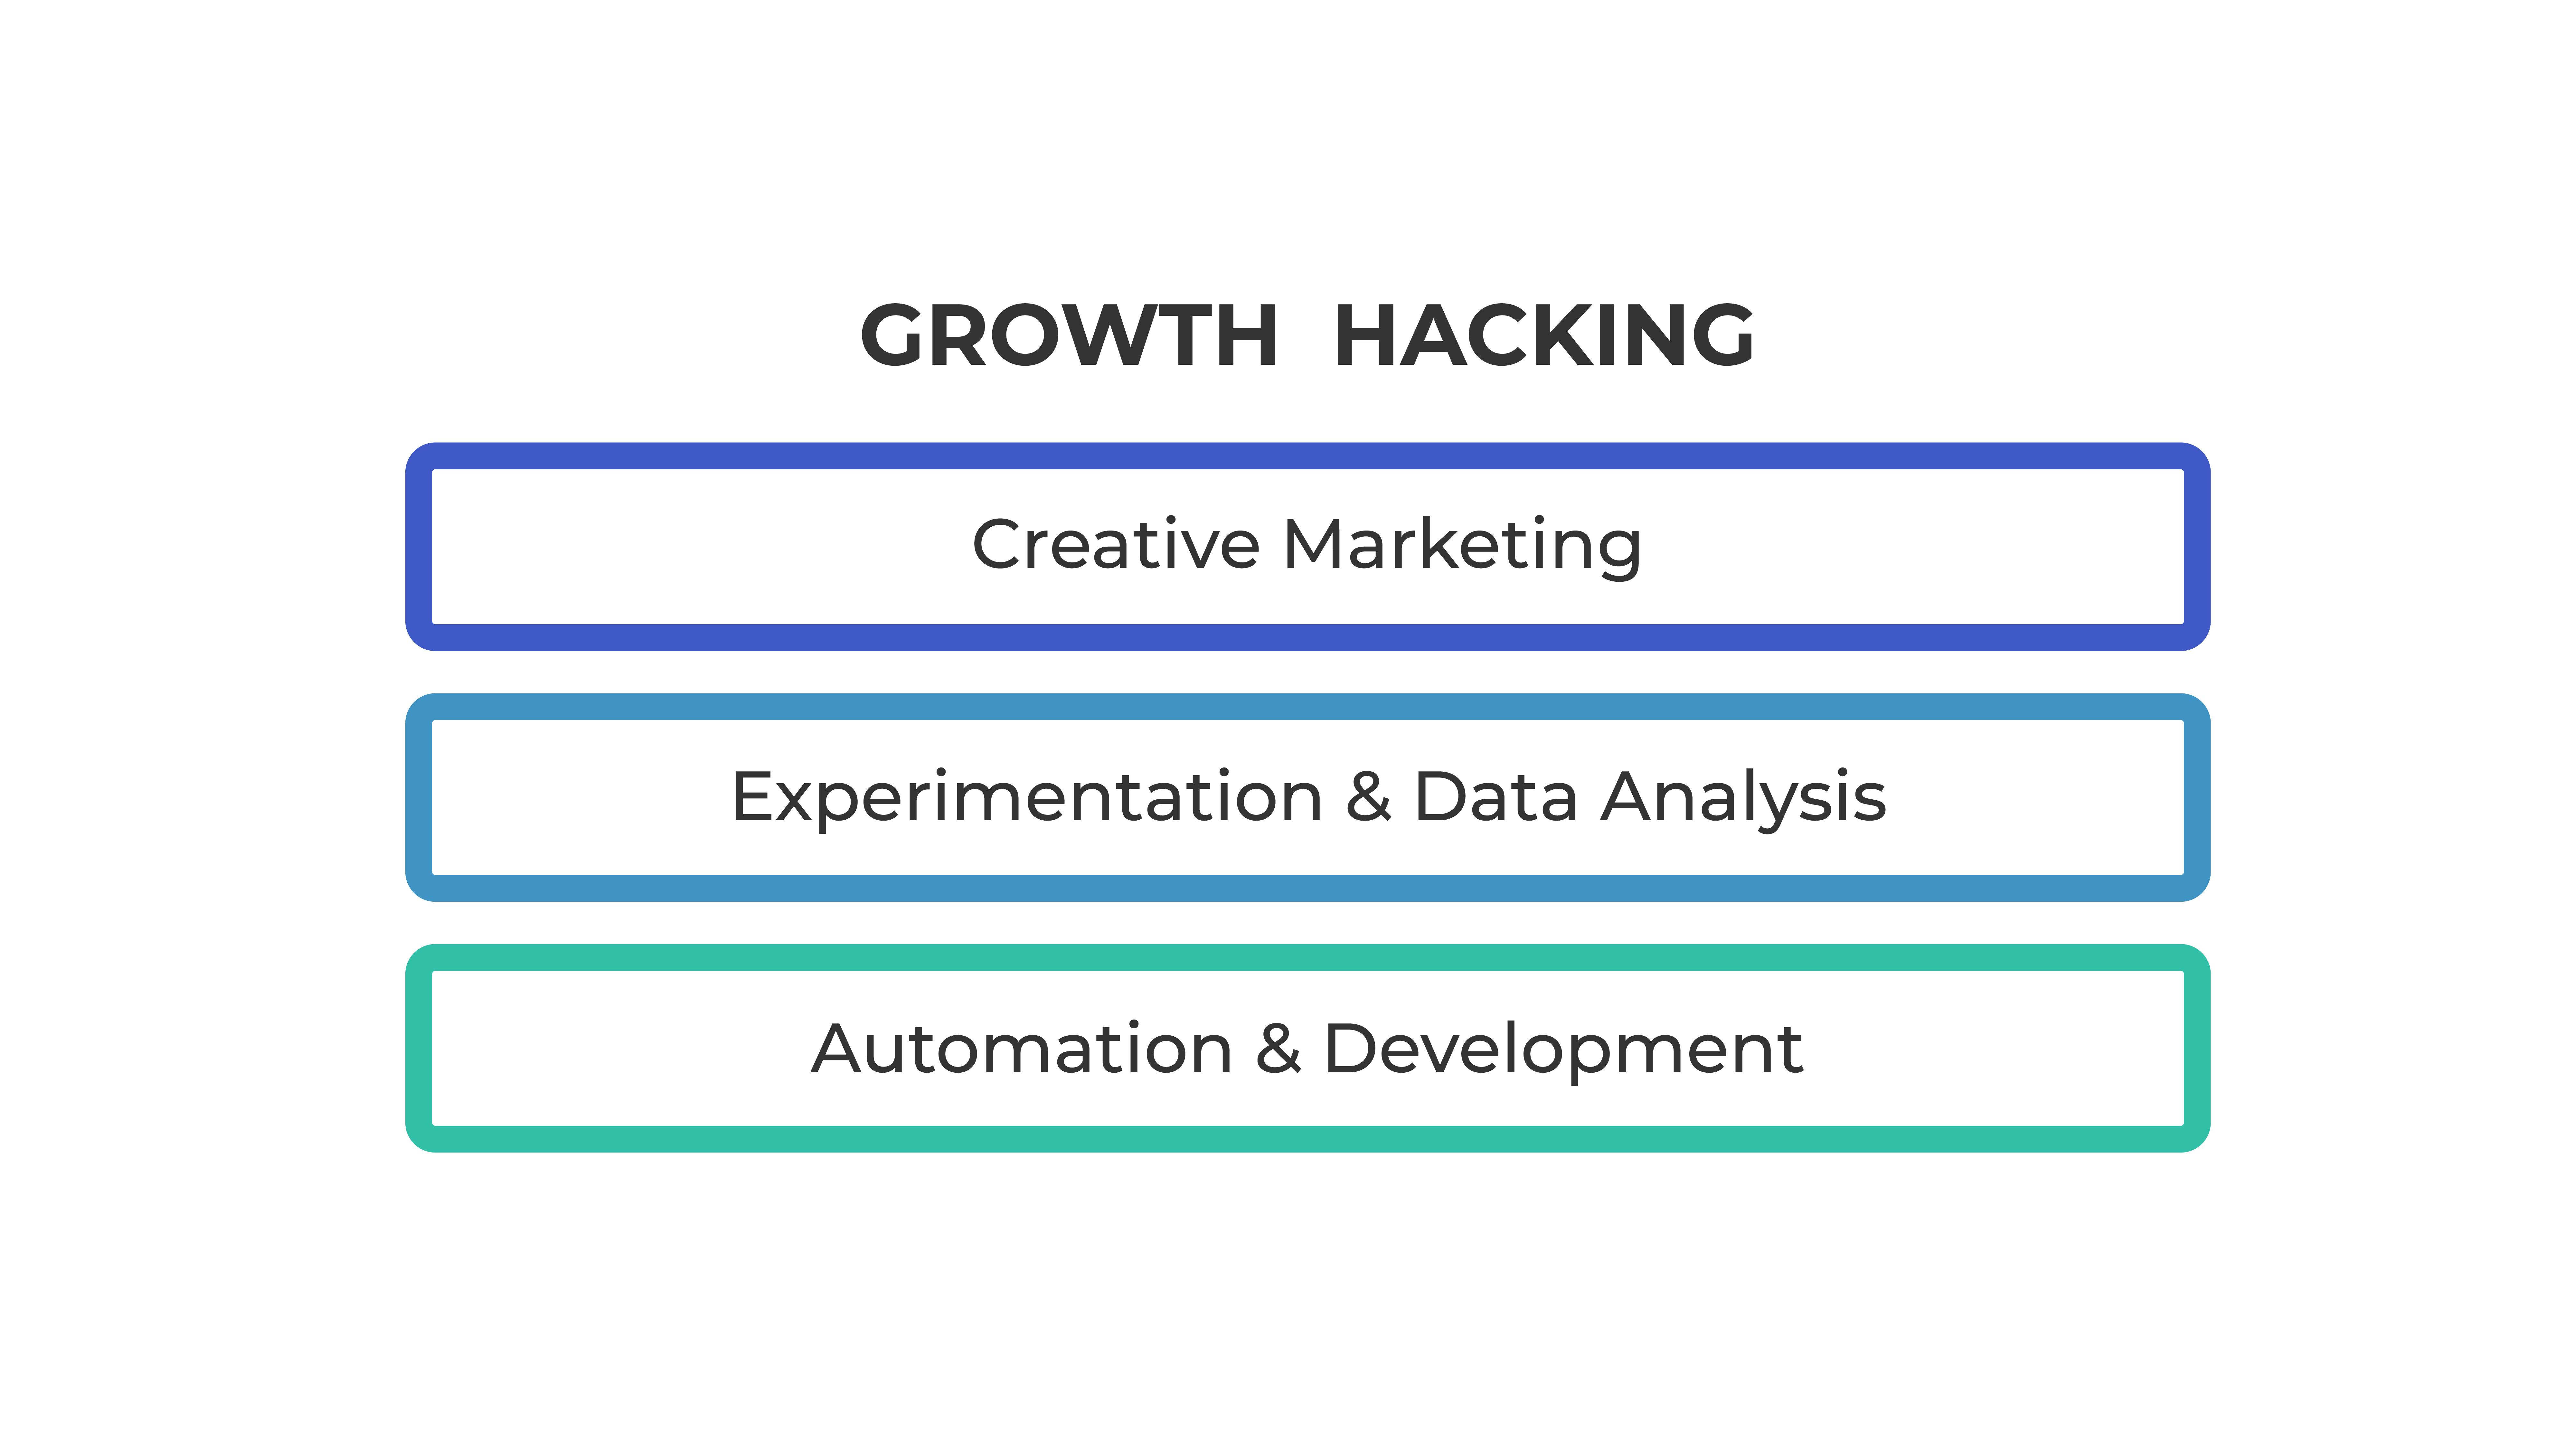 Creative marketing, experimentation and data analysis, automation and development